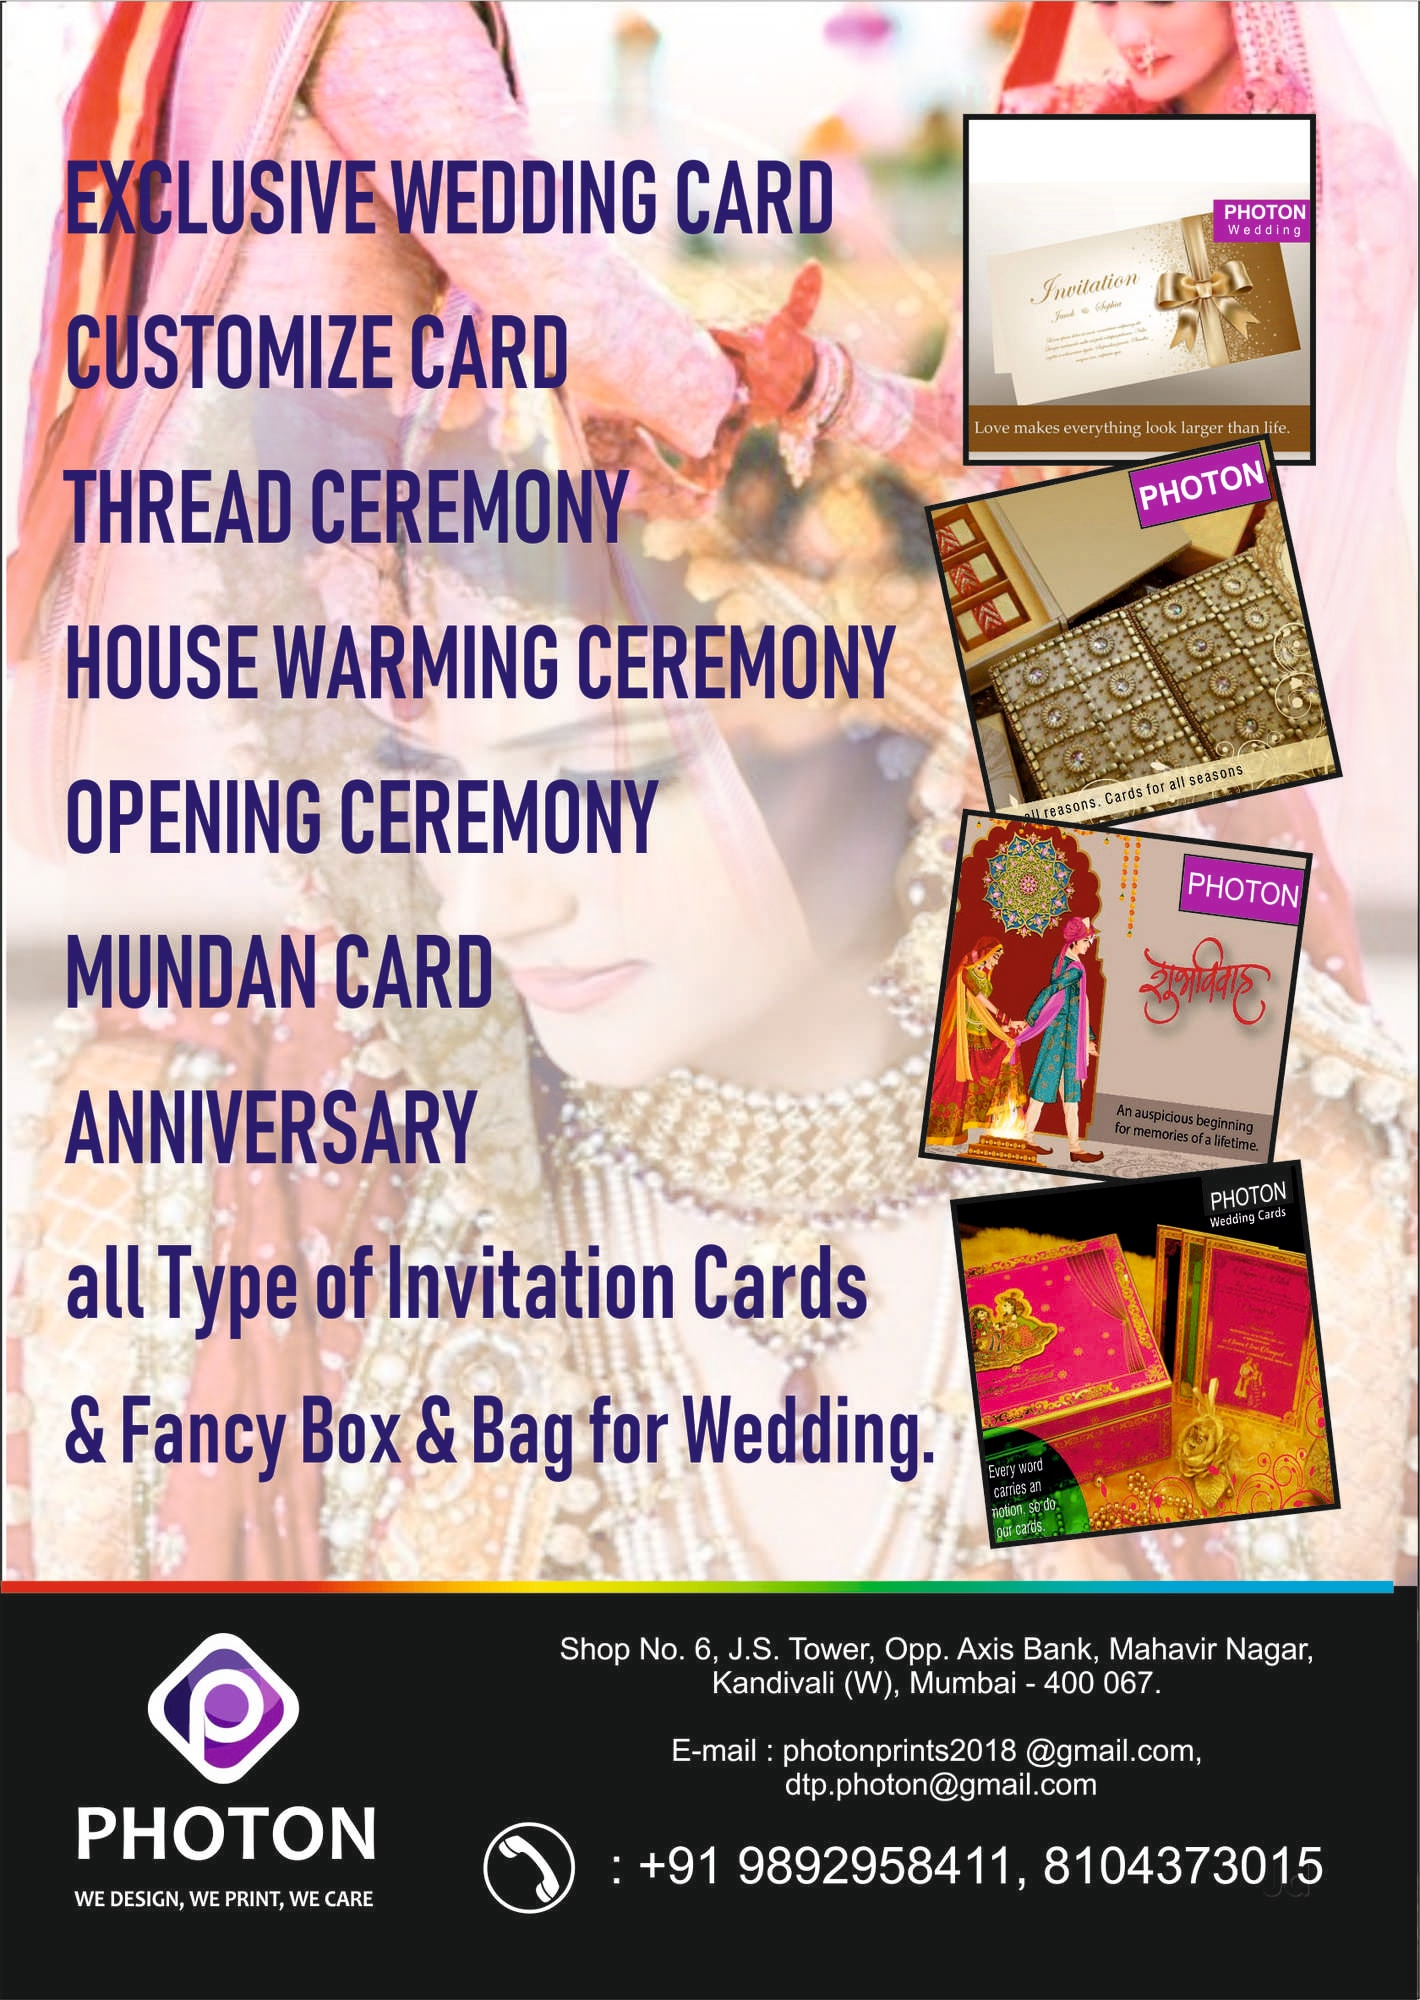 Hair Cutting Ceremony Invitation Cards